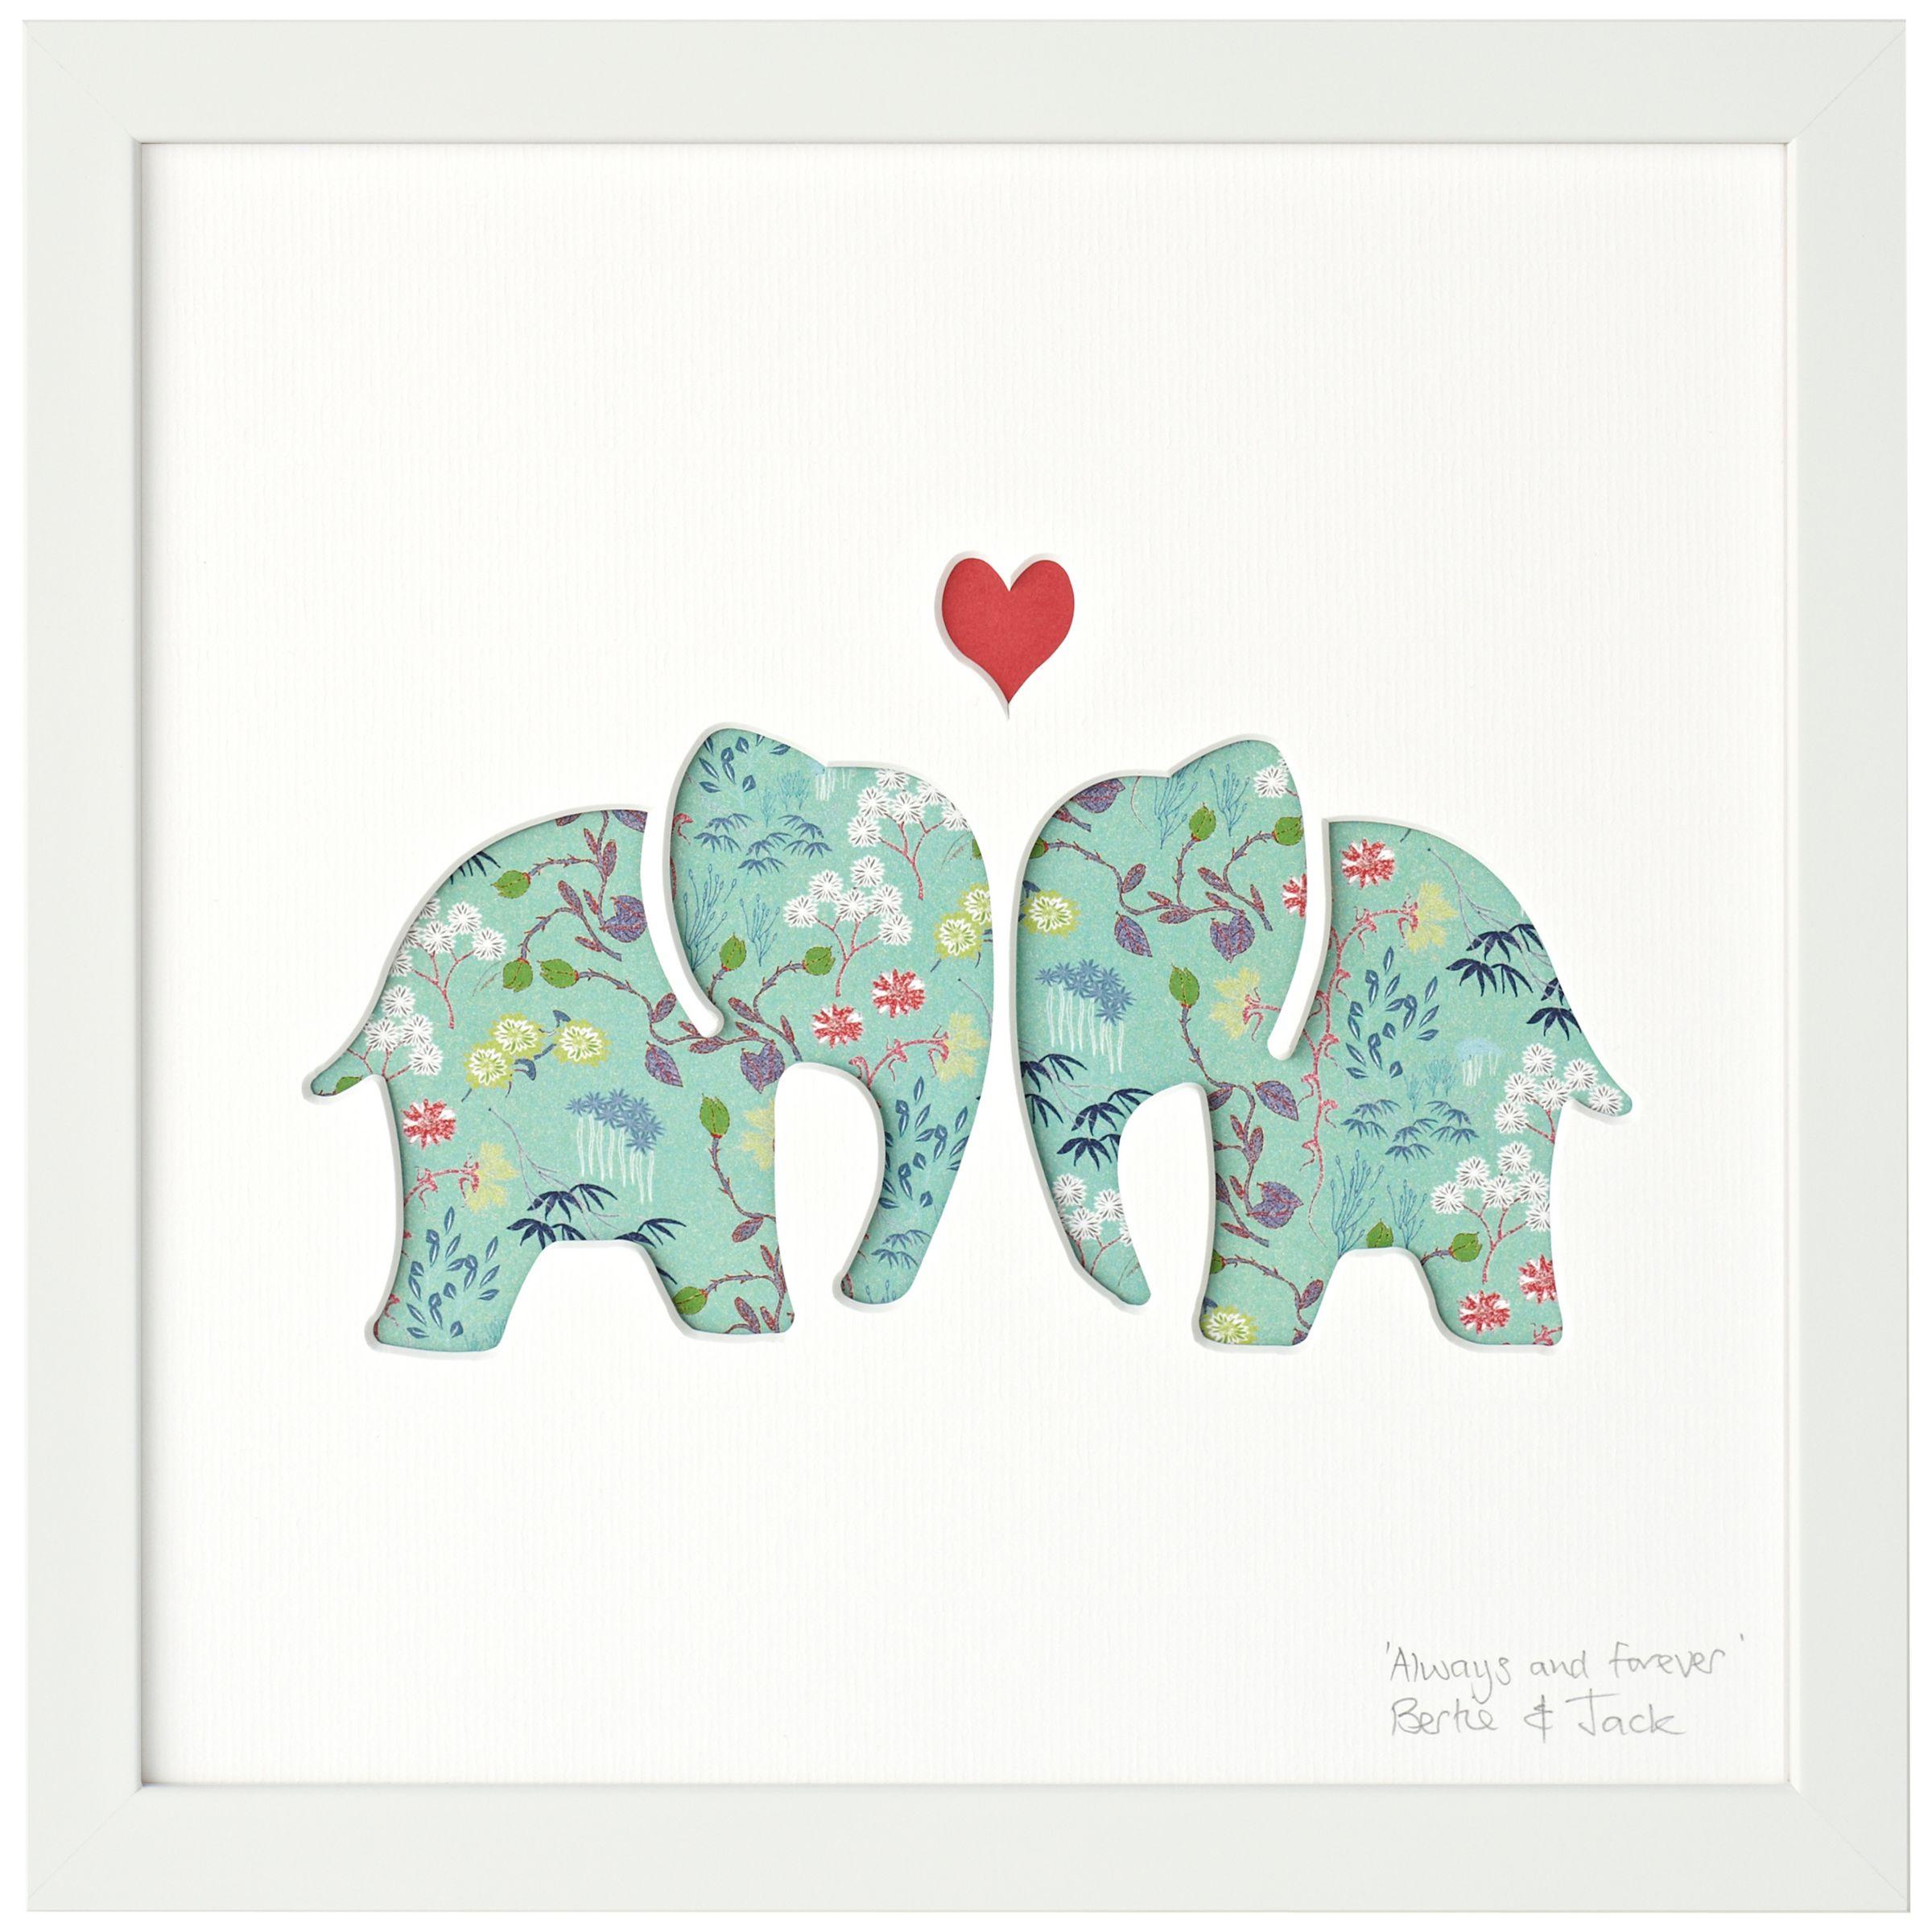 Bertie & Jack Bertie & Jack 'Always and Forever' Elephants Framed Cut-out, 27.4 x 27.4cm